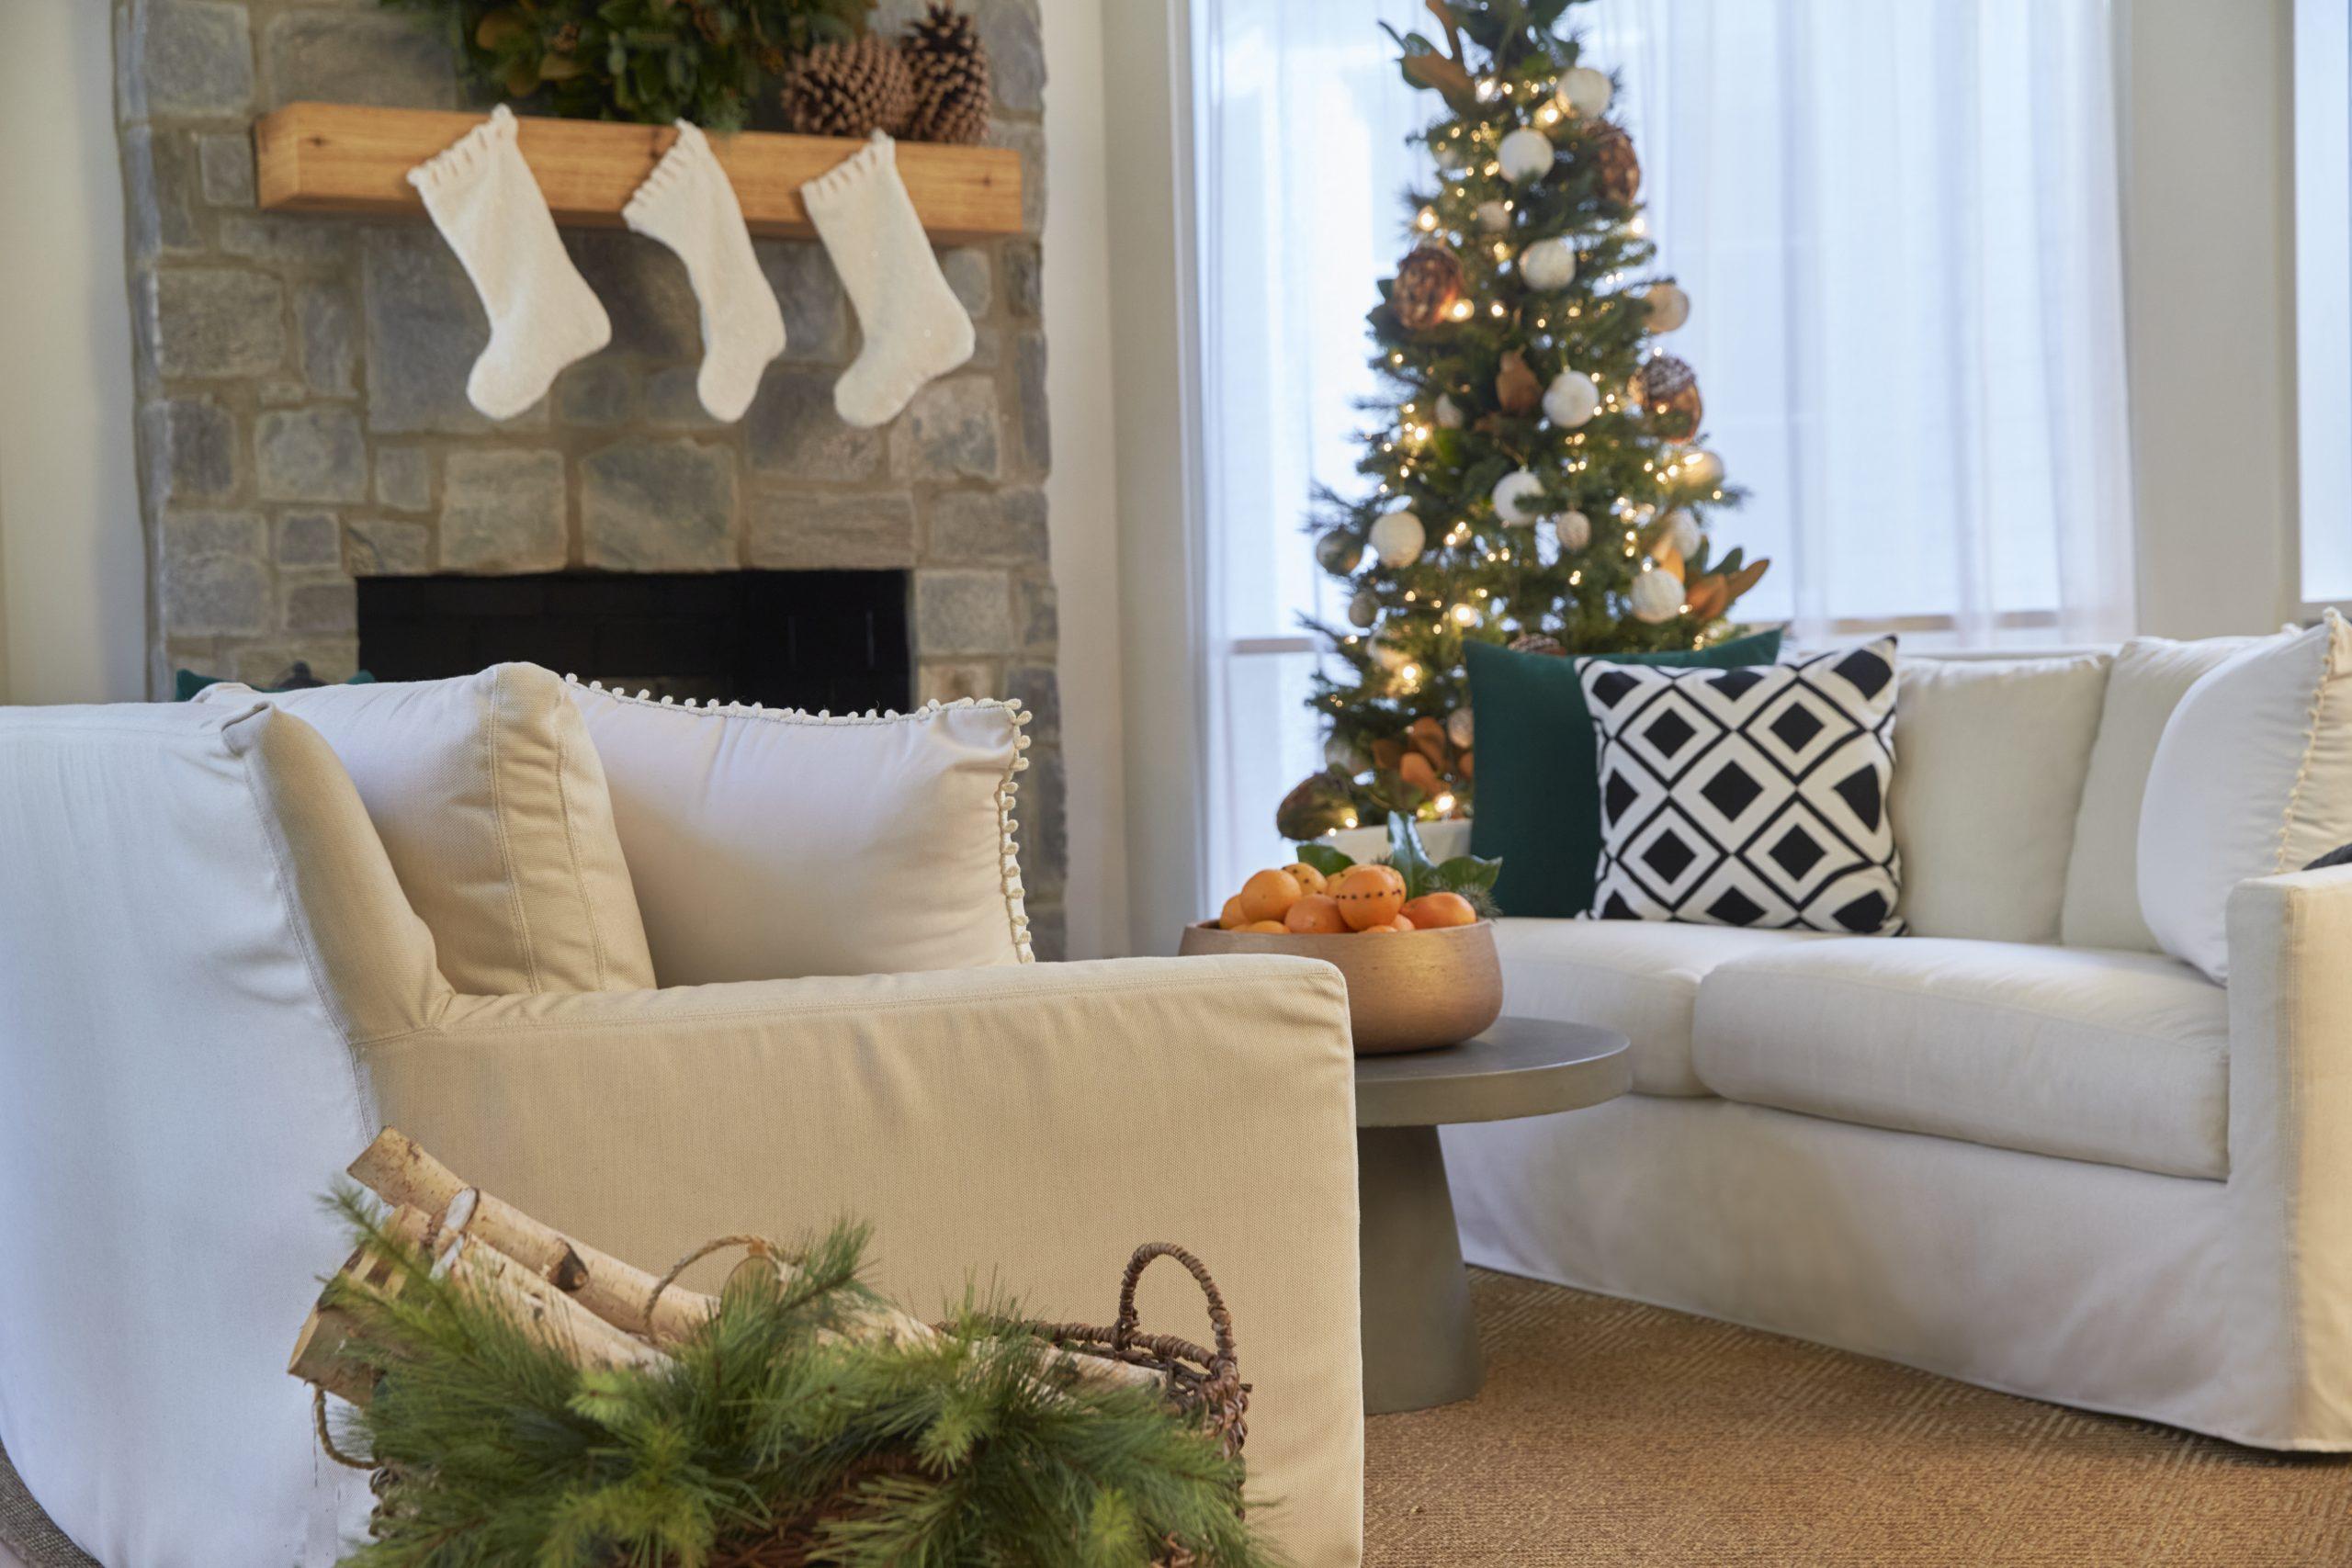 Sunbrella-fabrics-sofa-holiday-styling